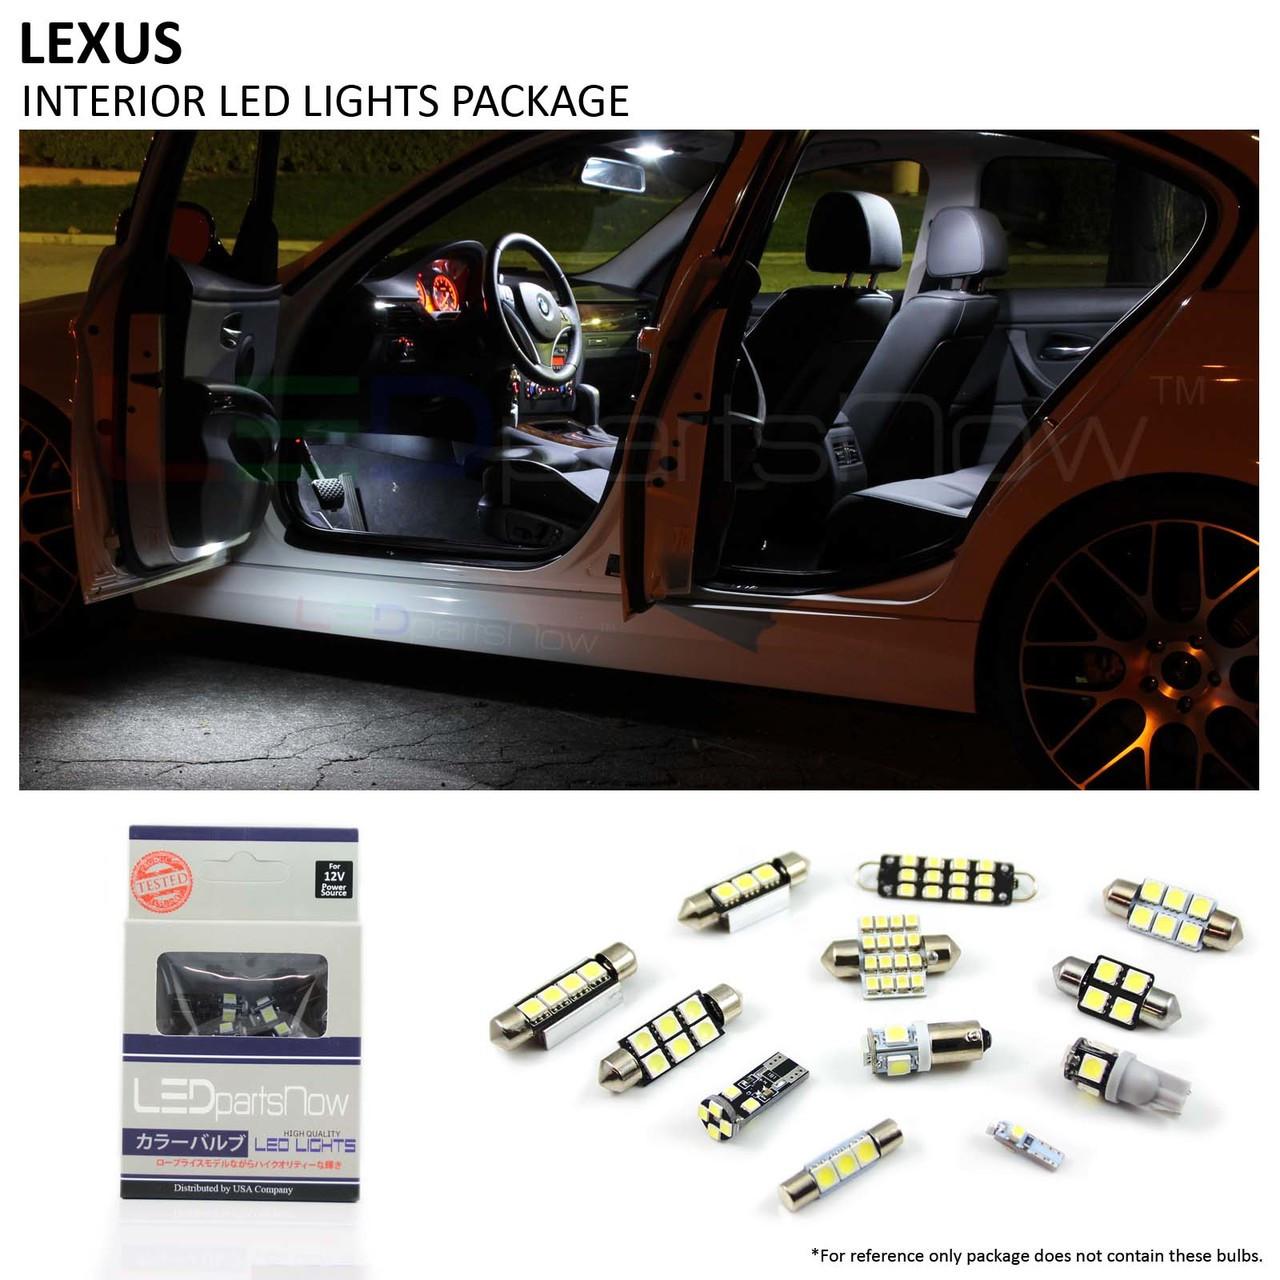 2000 honda accord led interior lights